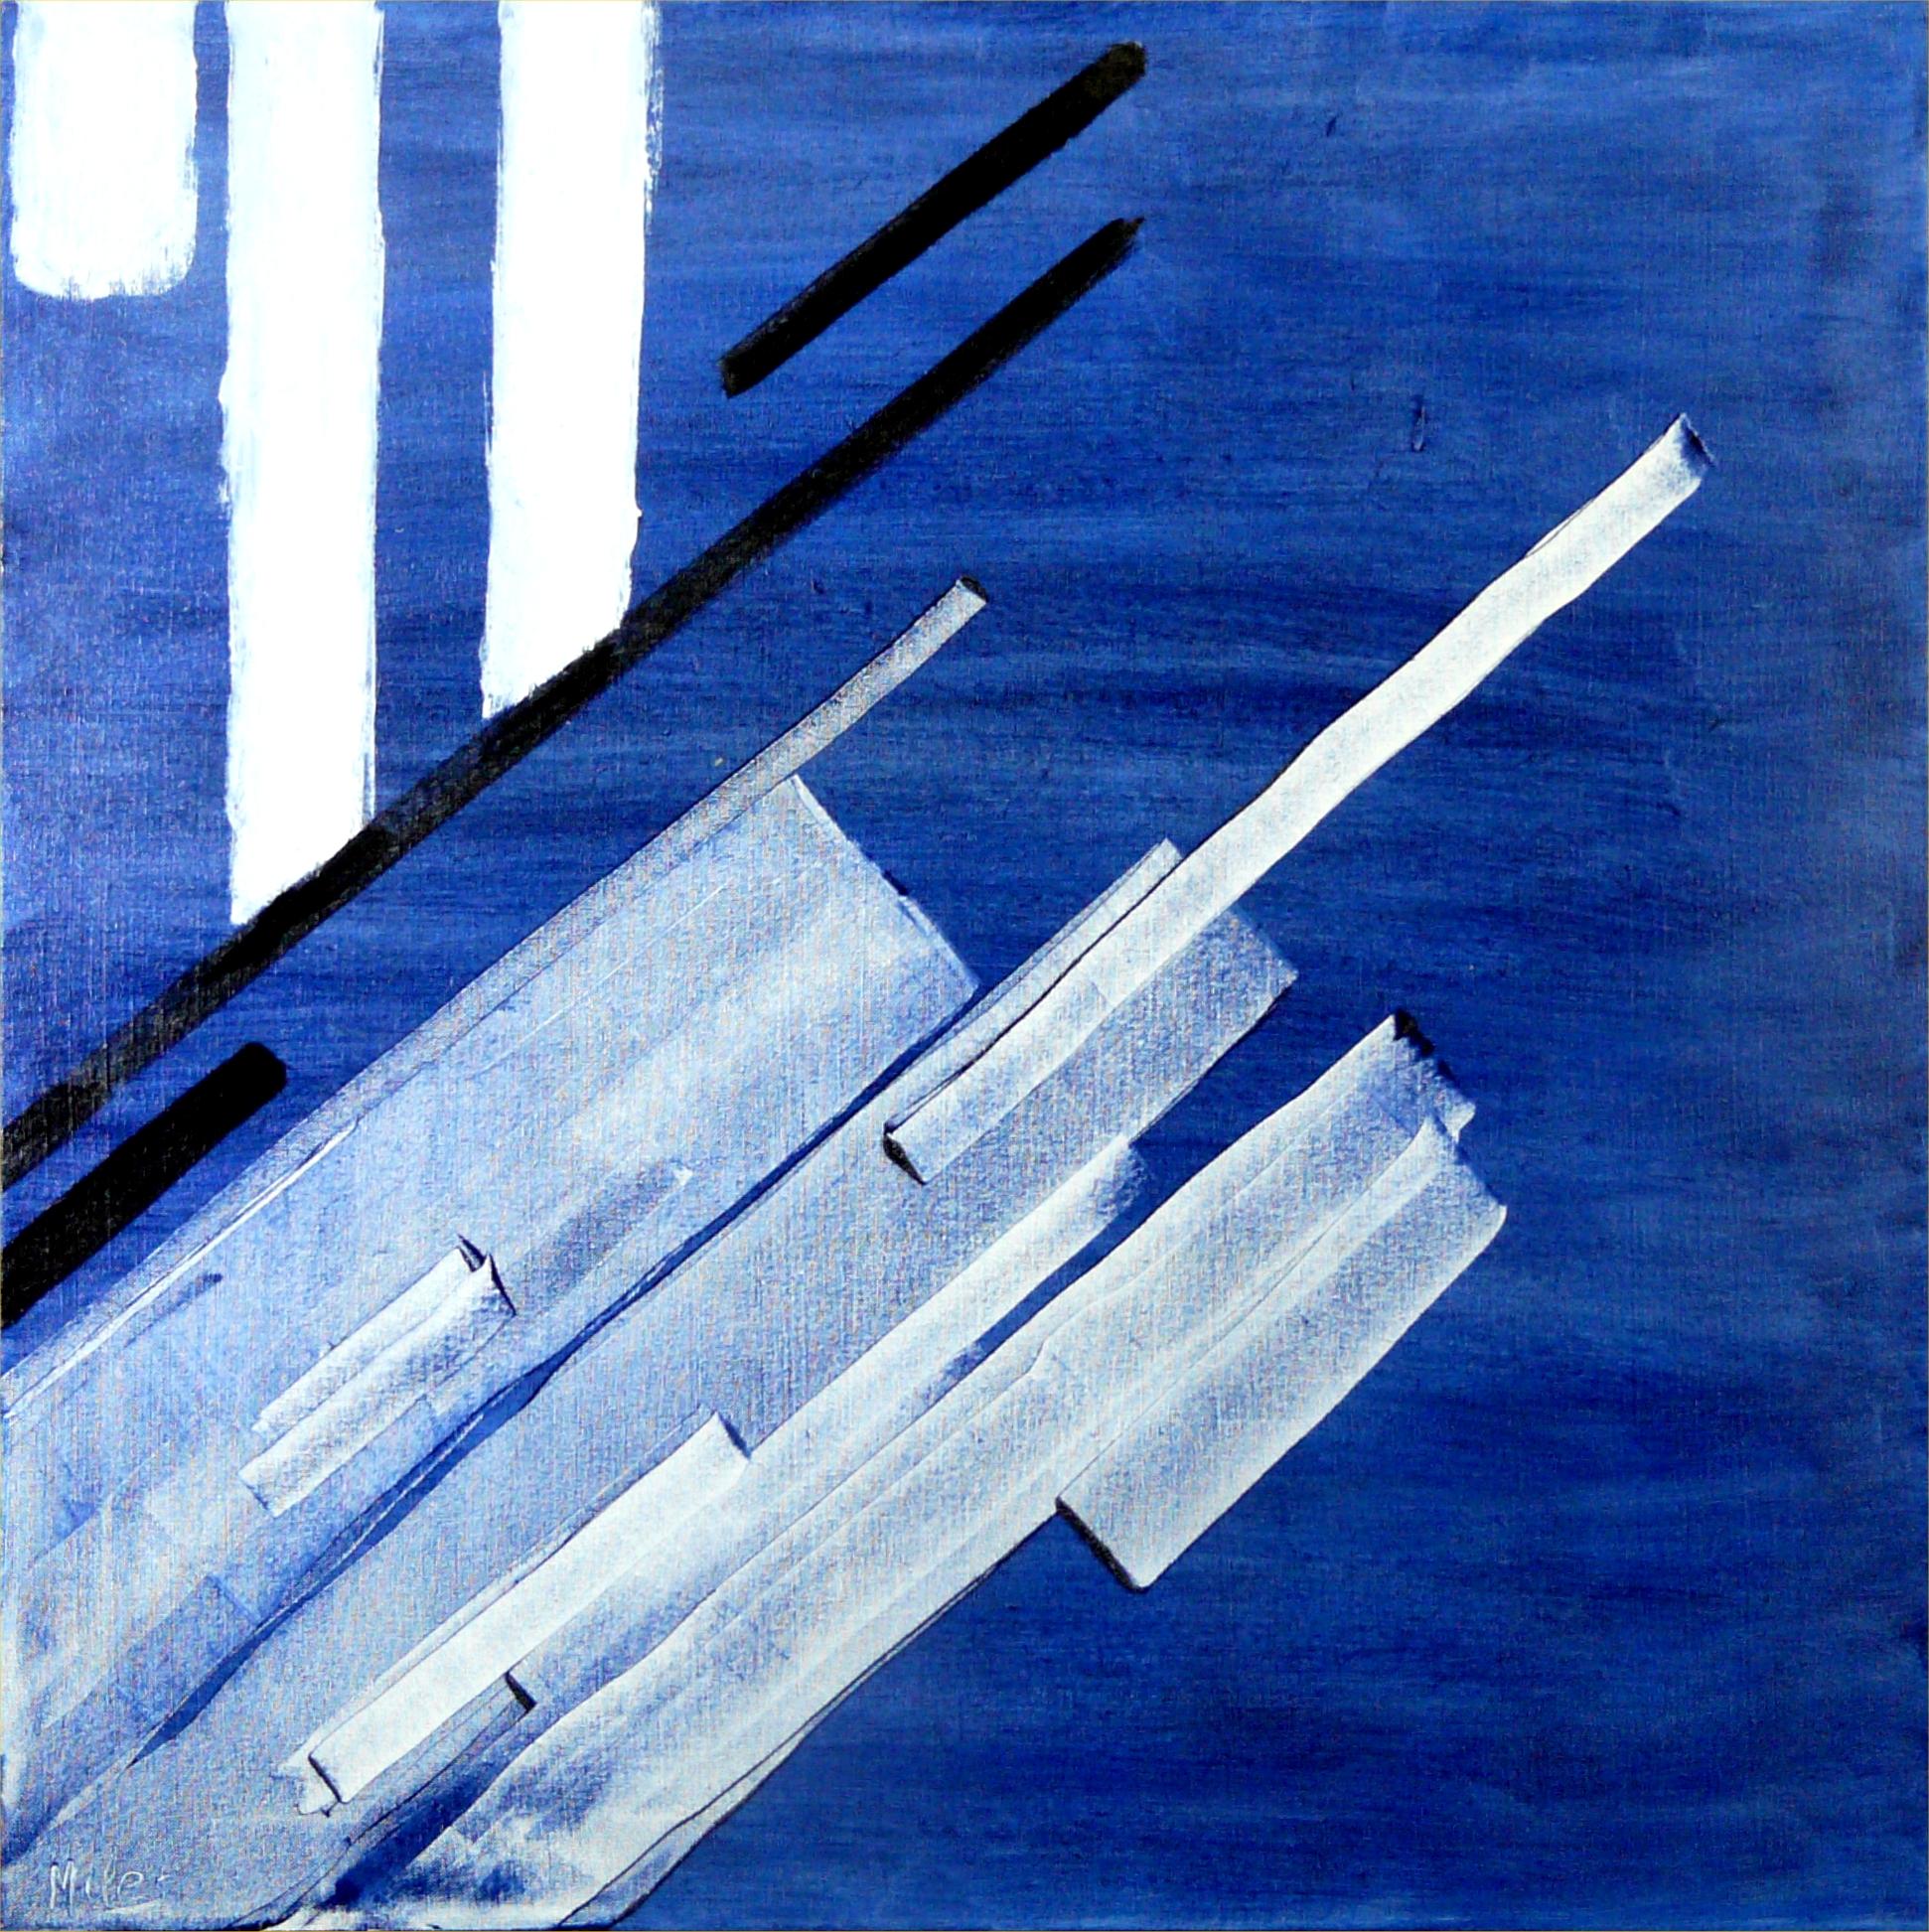 Blue 2: Bedding Planes